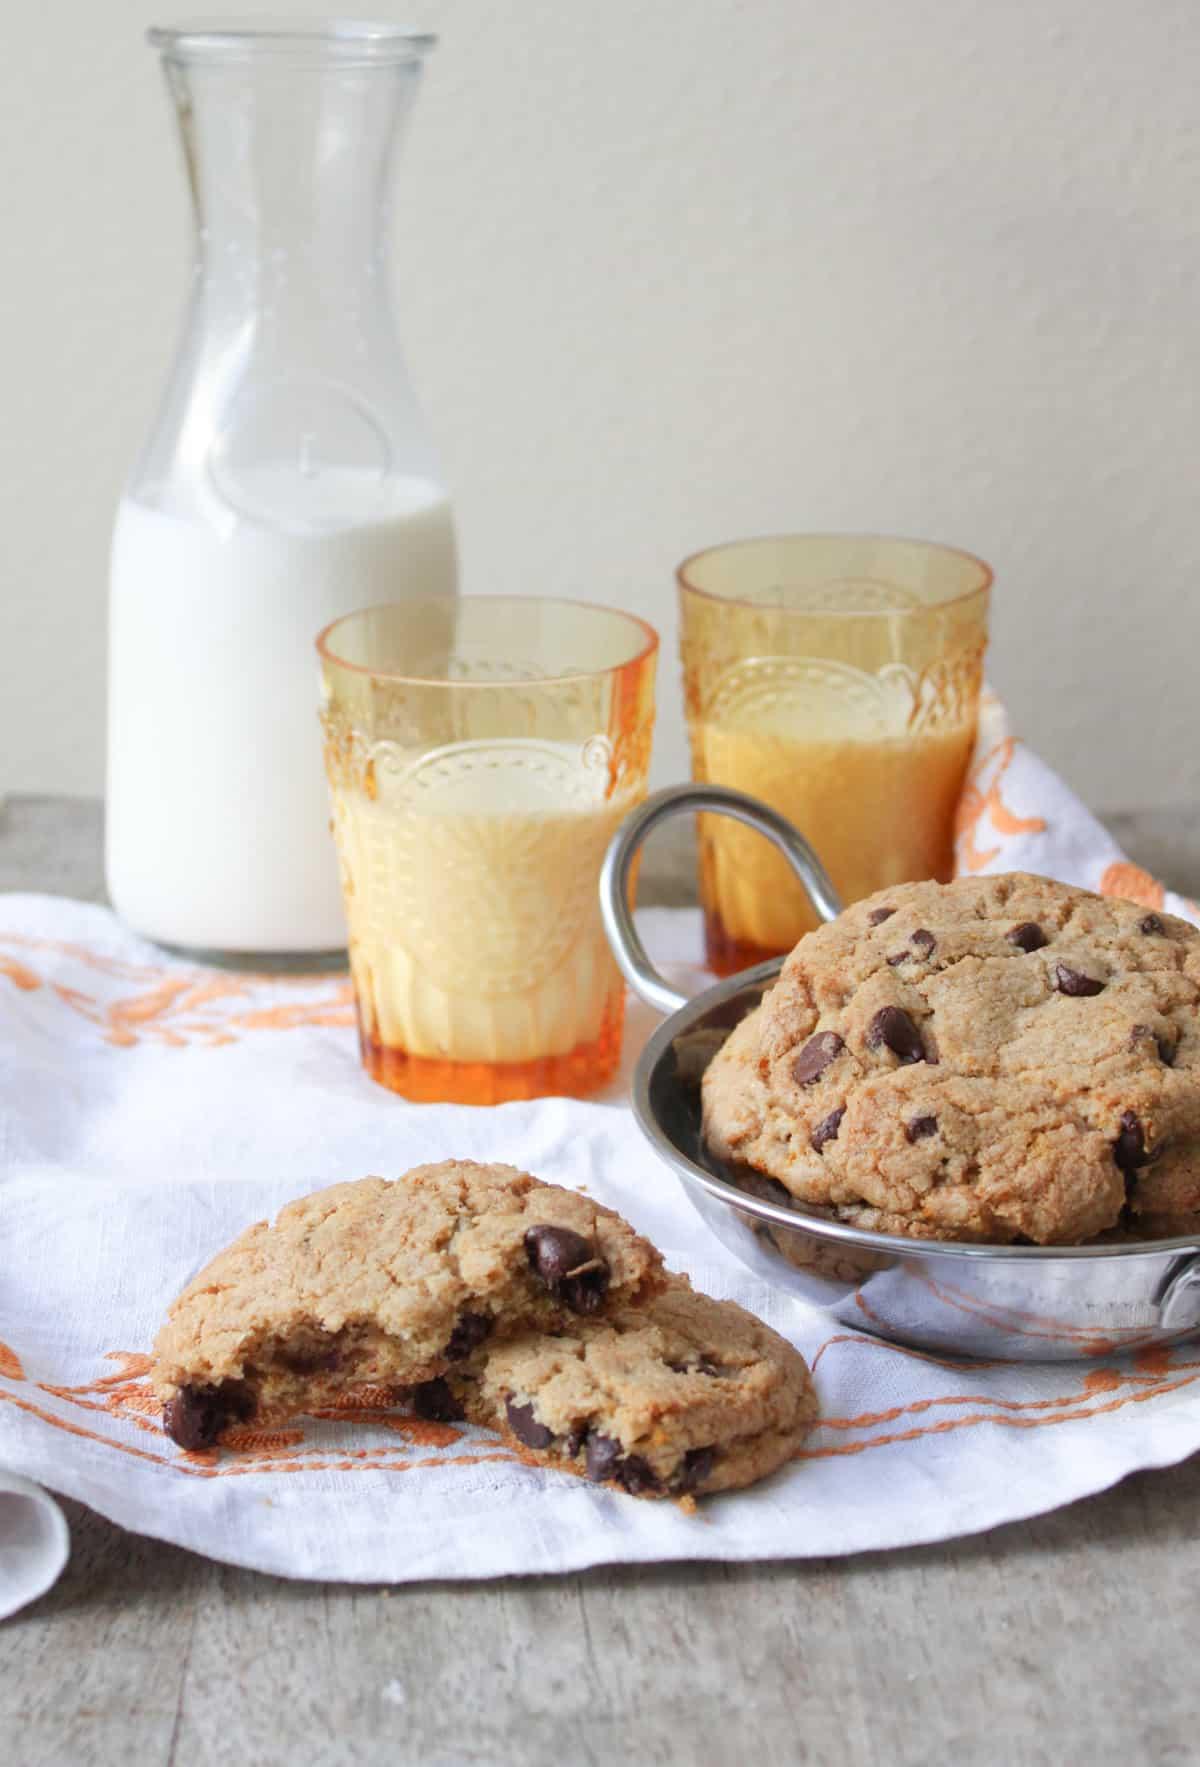 Orange Cardamom Chocolate Chip Cookies - The Little Epicurean